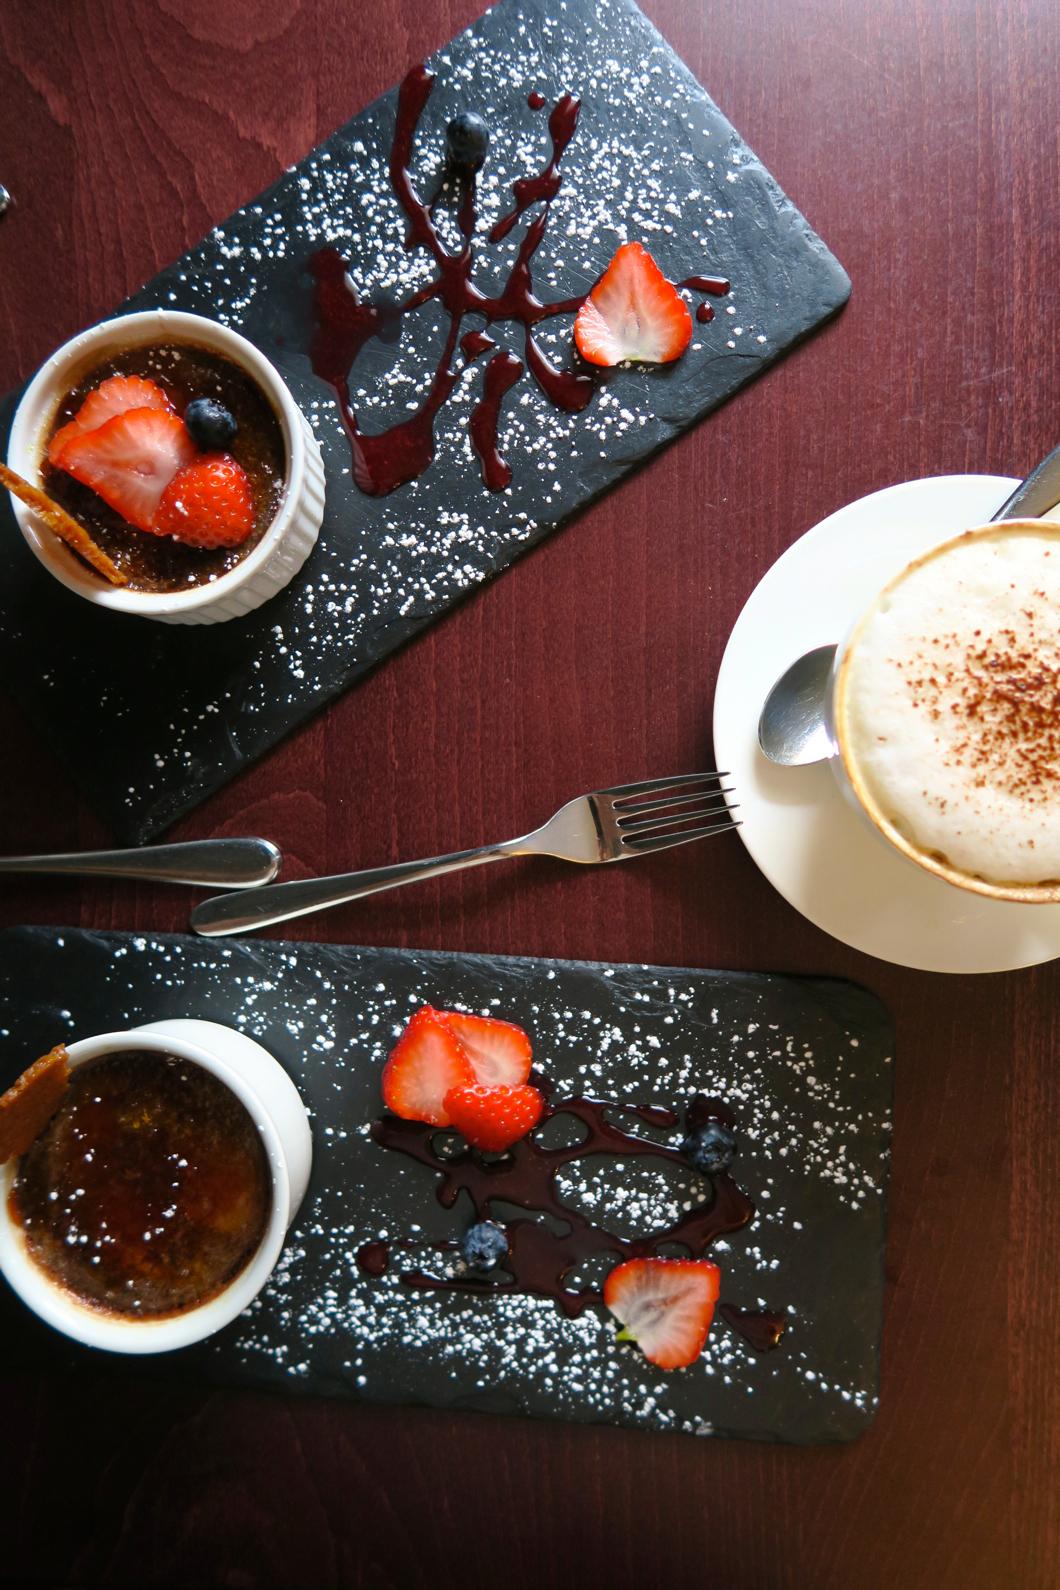 Raspberry and chocolate creme brûlée